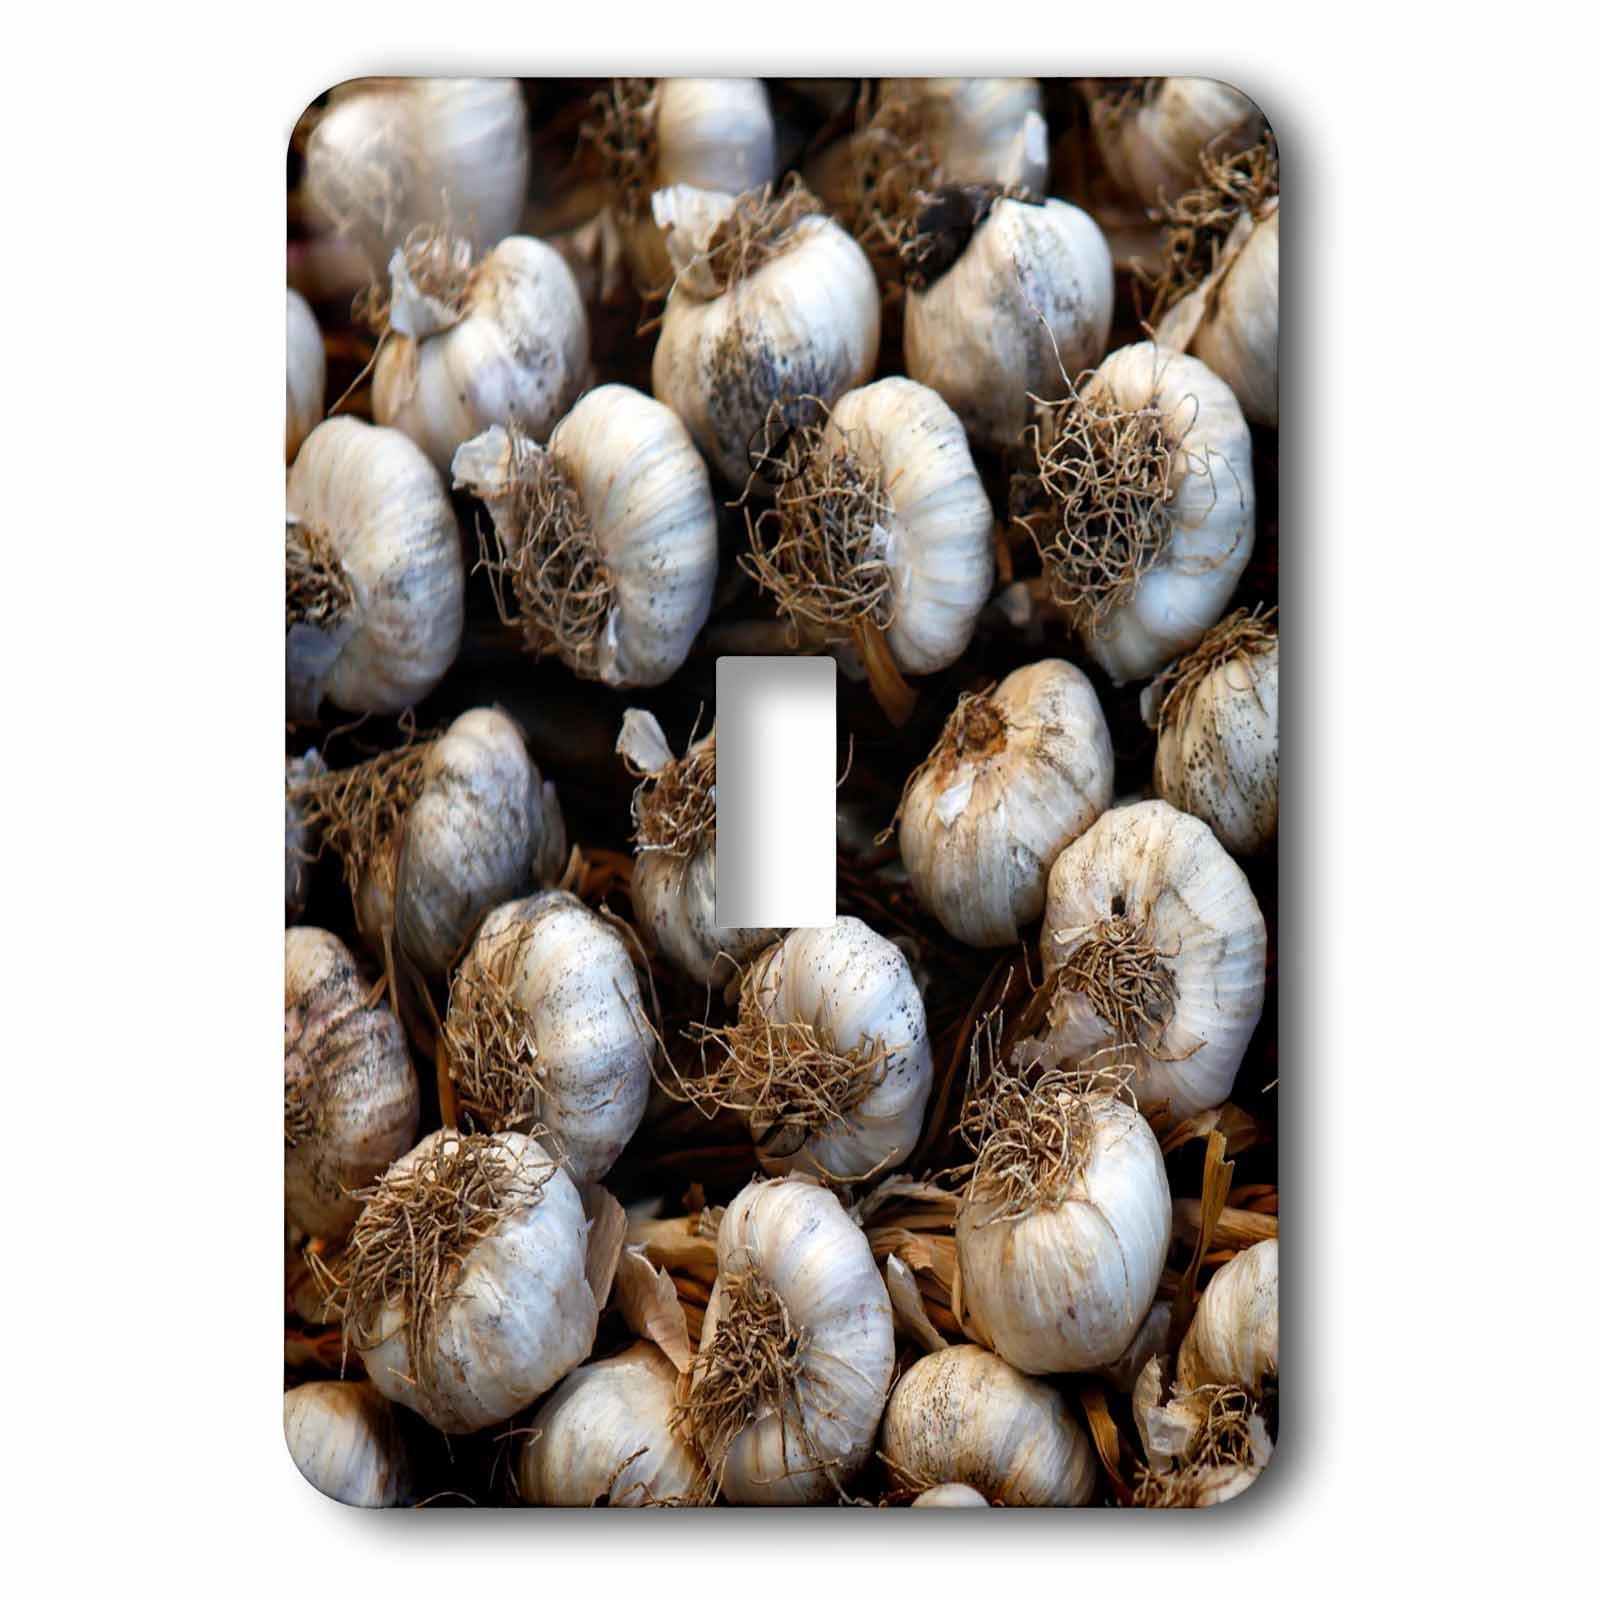 3dRose lsp_188723_1 Central America, Cuba, Santa Clara. Garlic Cloves for Sale. - Single Toggle Switch